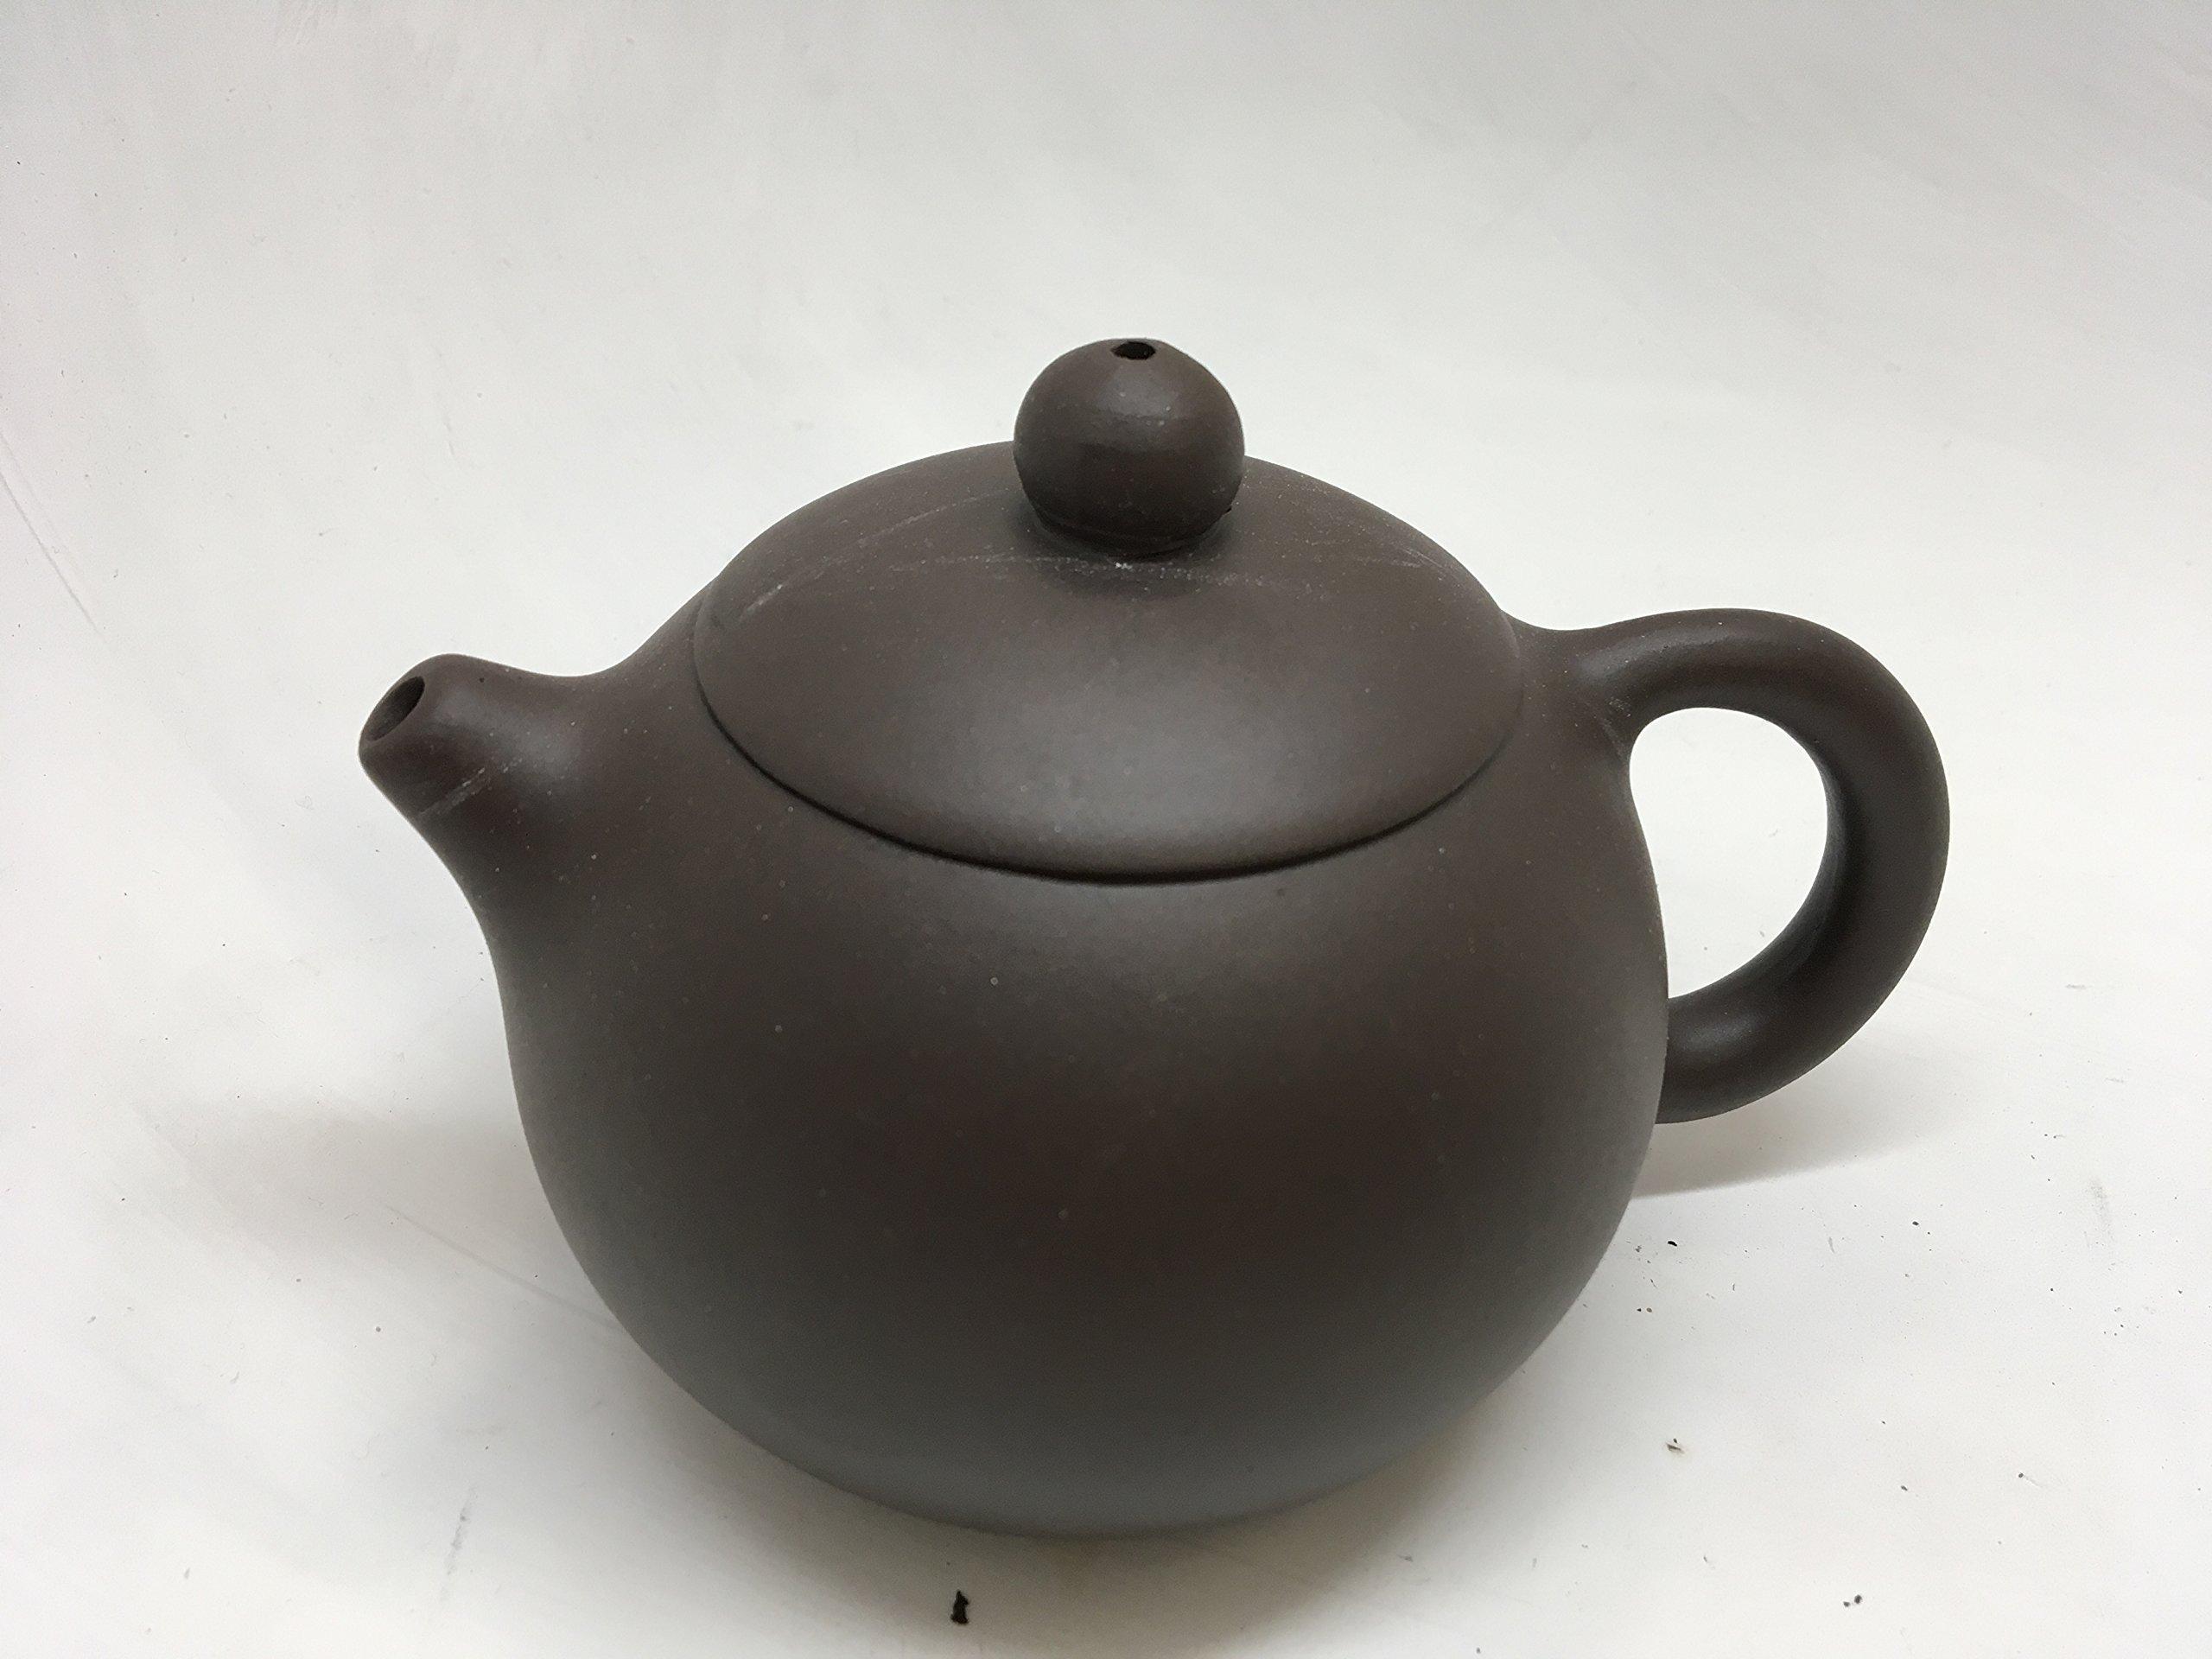 Music City Tea Yixing Tea Pot with 10oz Capacity Da Xishi #8 by Music City Tea